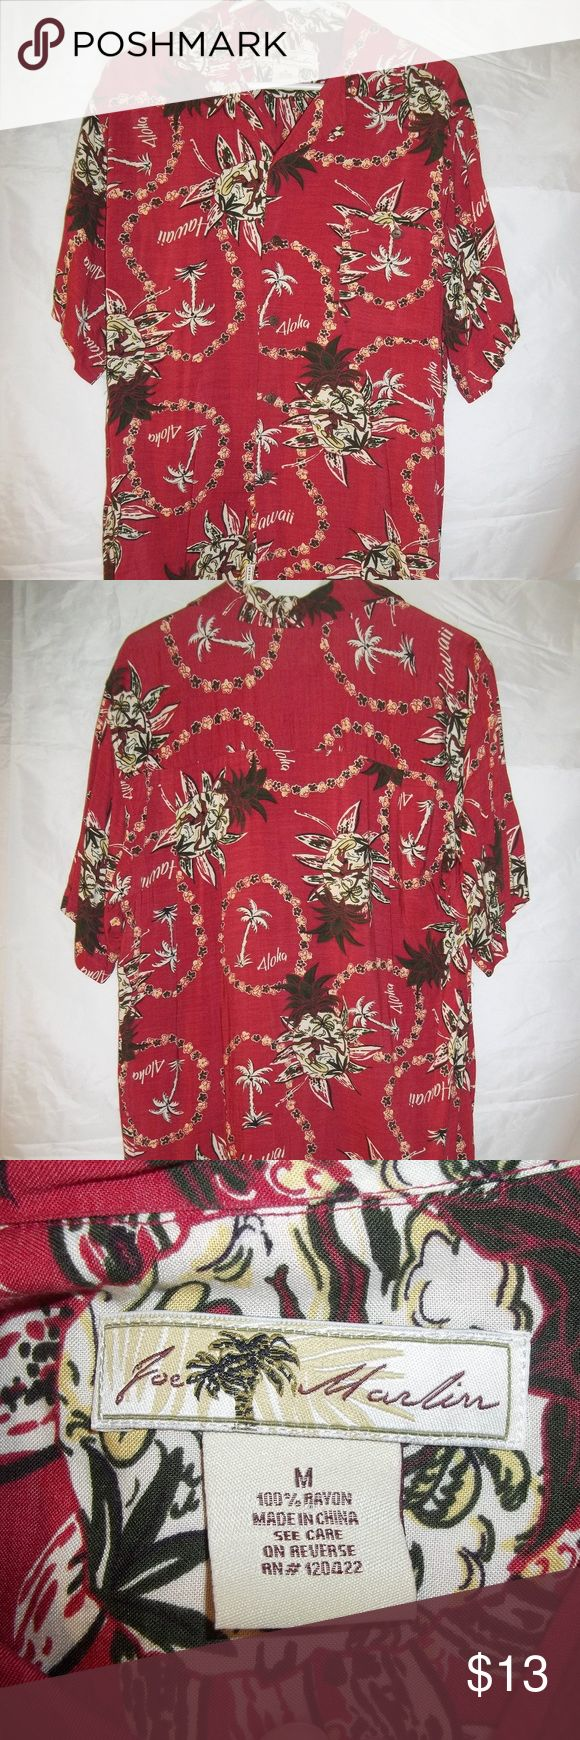 I just added this listing on Poshmark: Joe Marlin Hawaiian Shirt Button Men's Size Medium  #shopmycloset #poshmark #fashion #shopping #style #forsale #JoeMarlin #shirt #hawaiian #clothing #clothes #apparel #mens #mensfashion #menswear #mensstyle #poshmarkapp #poshmarkcloset